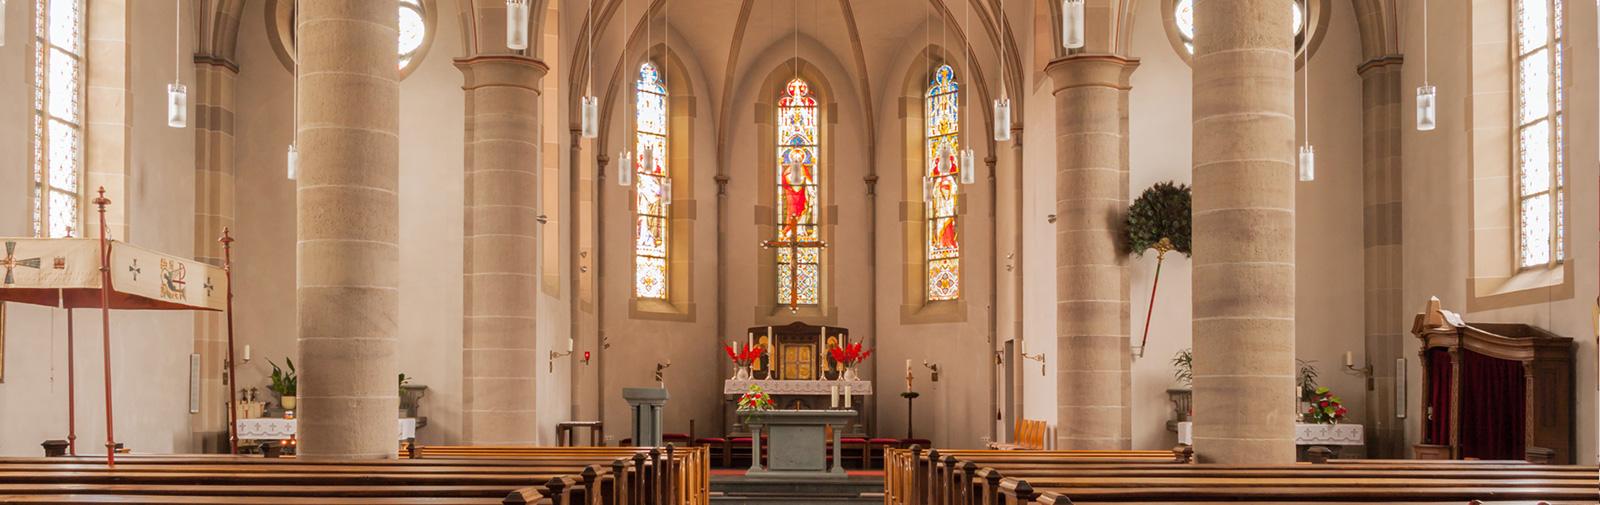 St. Liborius Bergheim